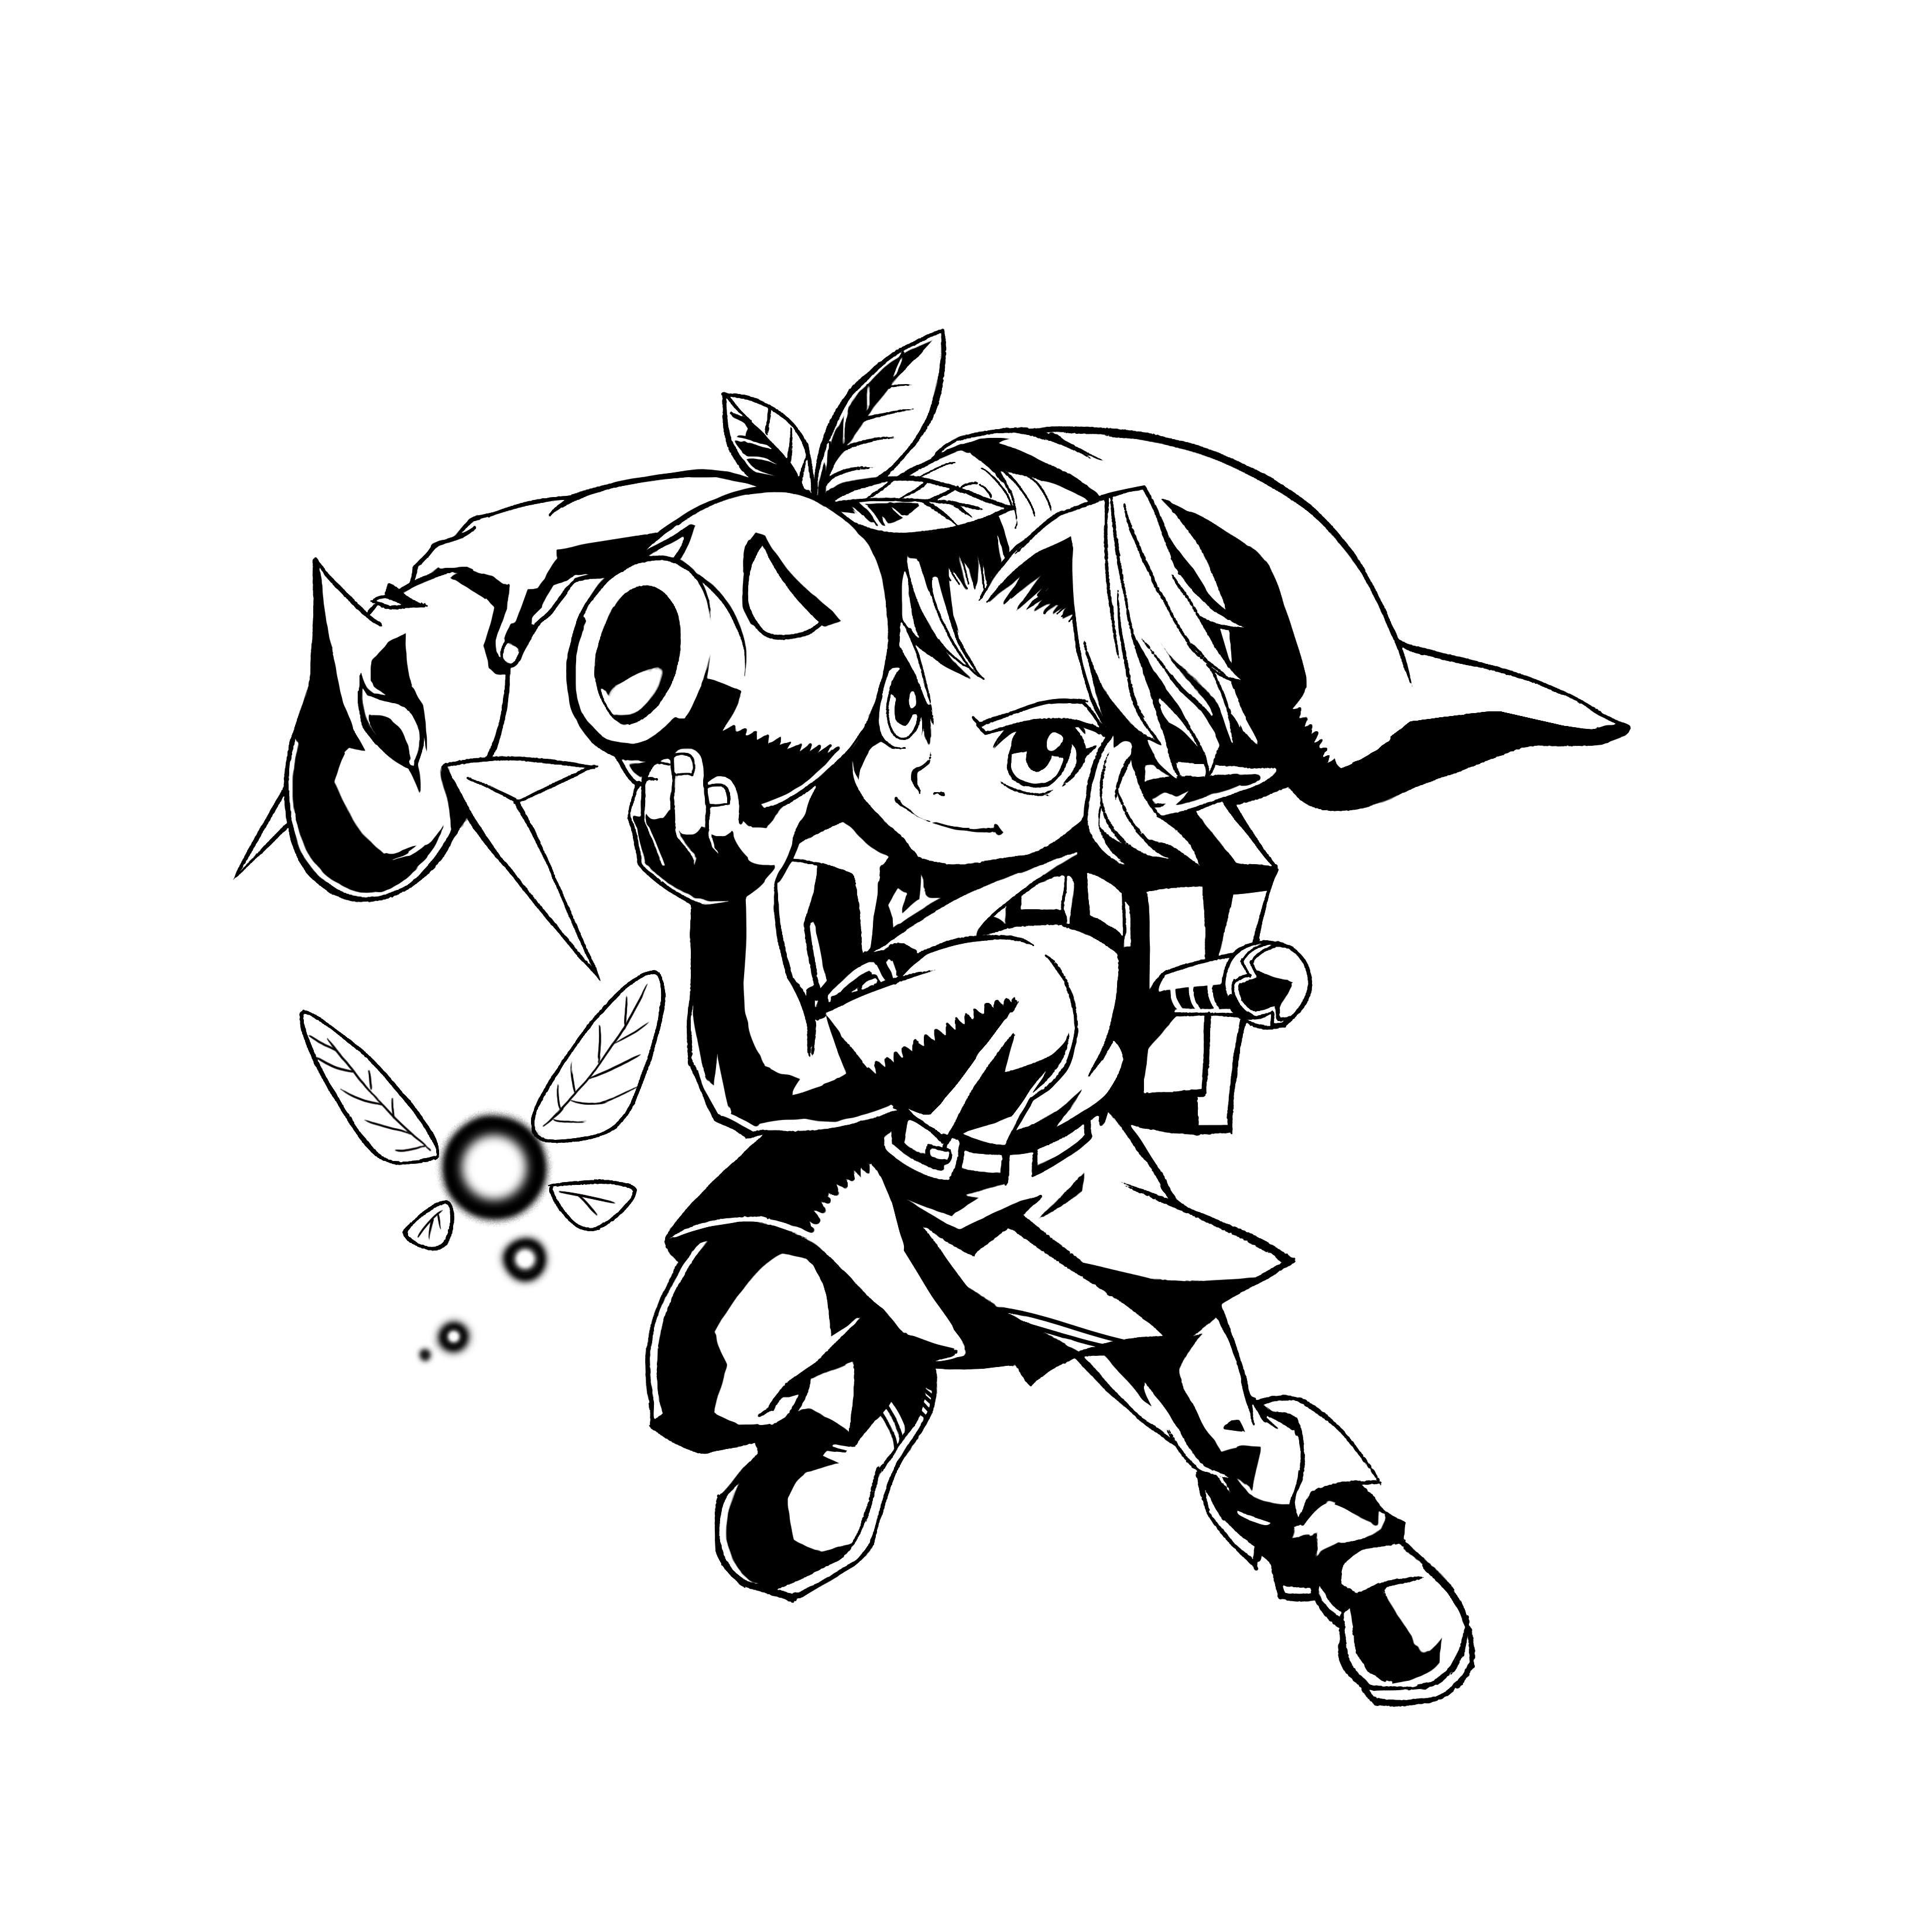 The Legend of Zelda: Majora's Mask 3D releases on February